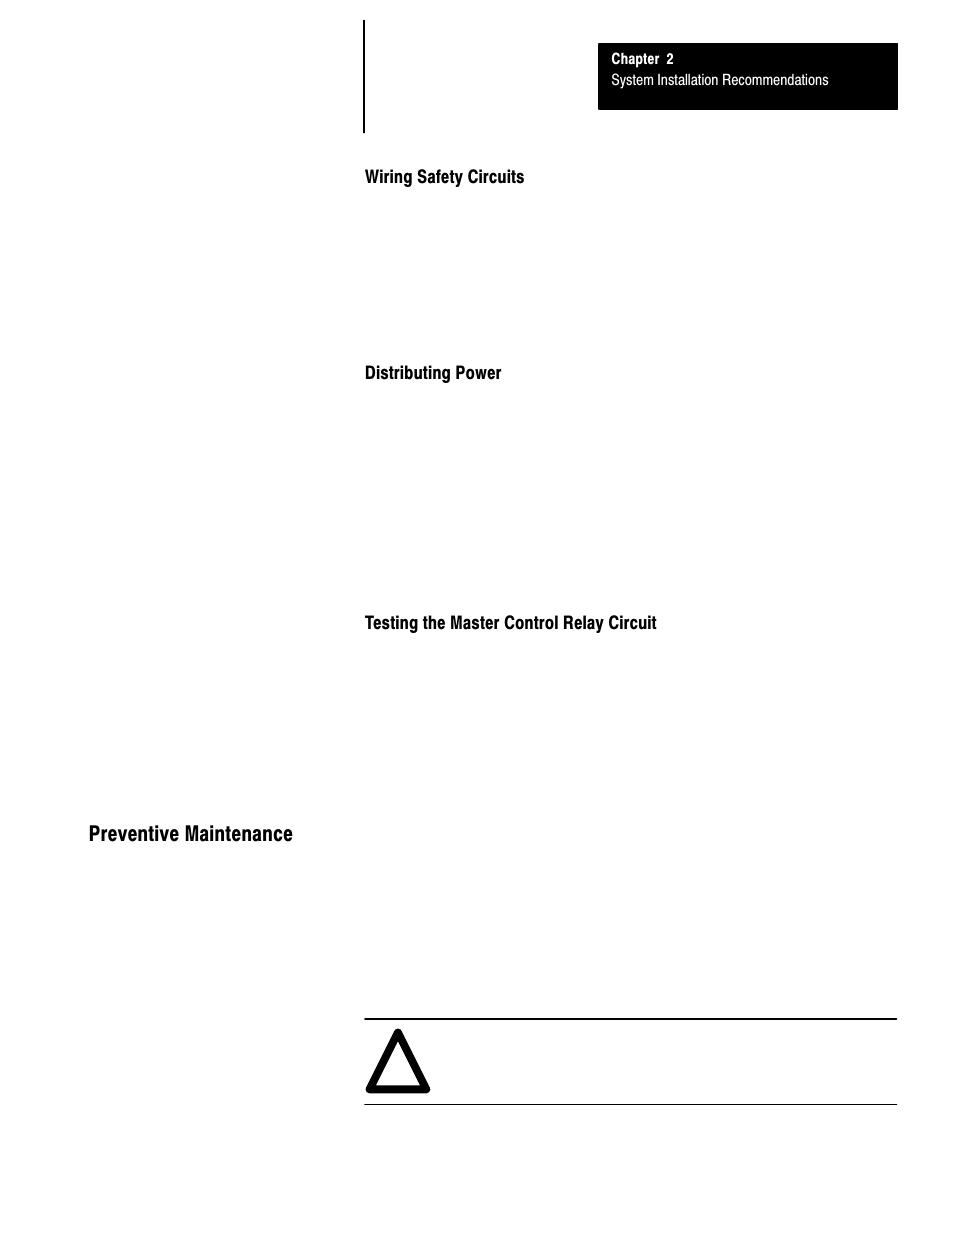 Master Control Relay Wiring Harness Schematics Zone Diagram Safety Circuits Distributing Power Testing The Rh Manualsdir Com Honeywell Burner Taco